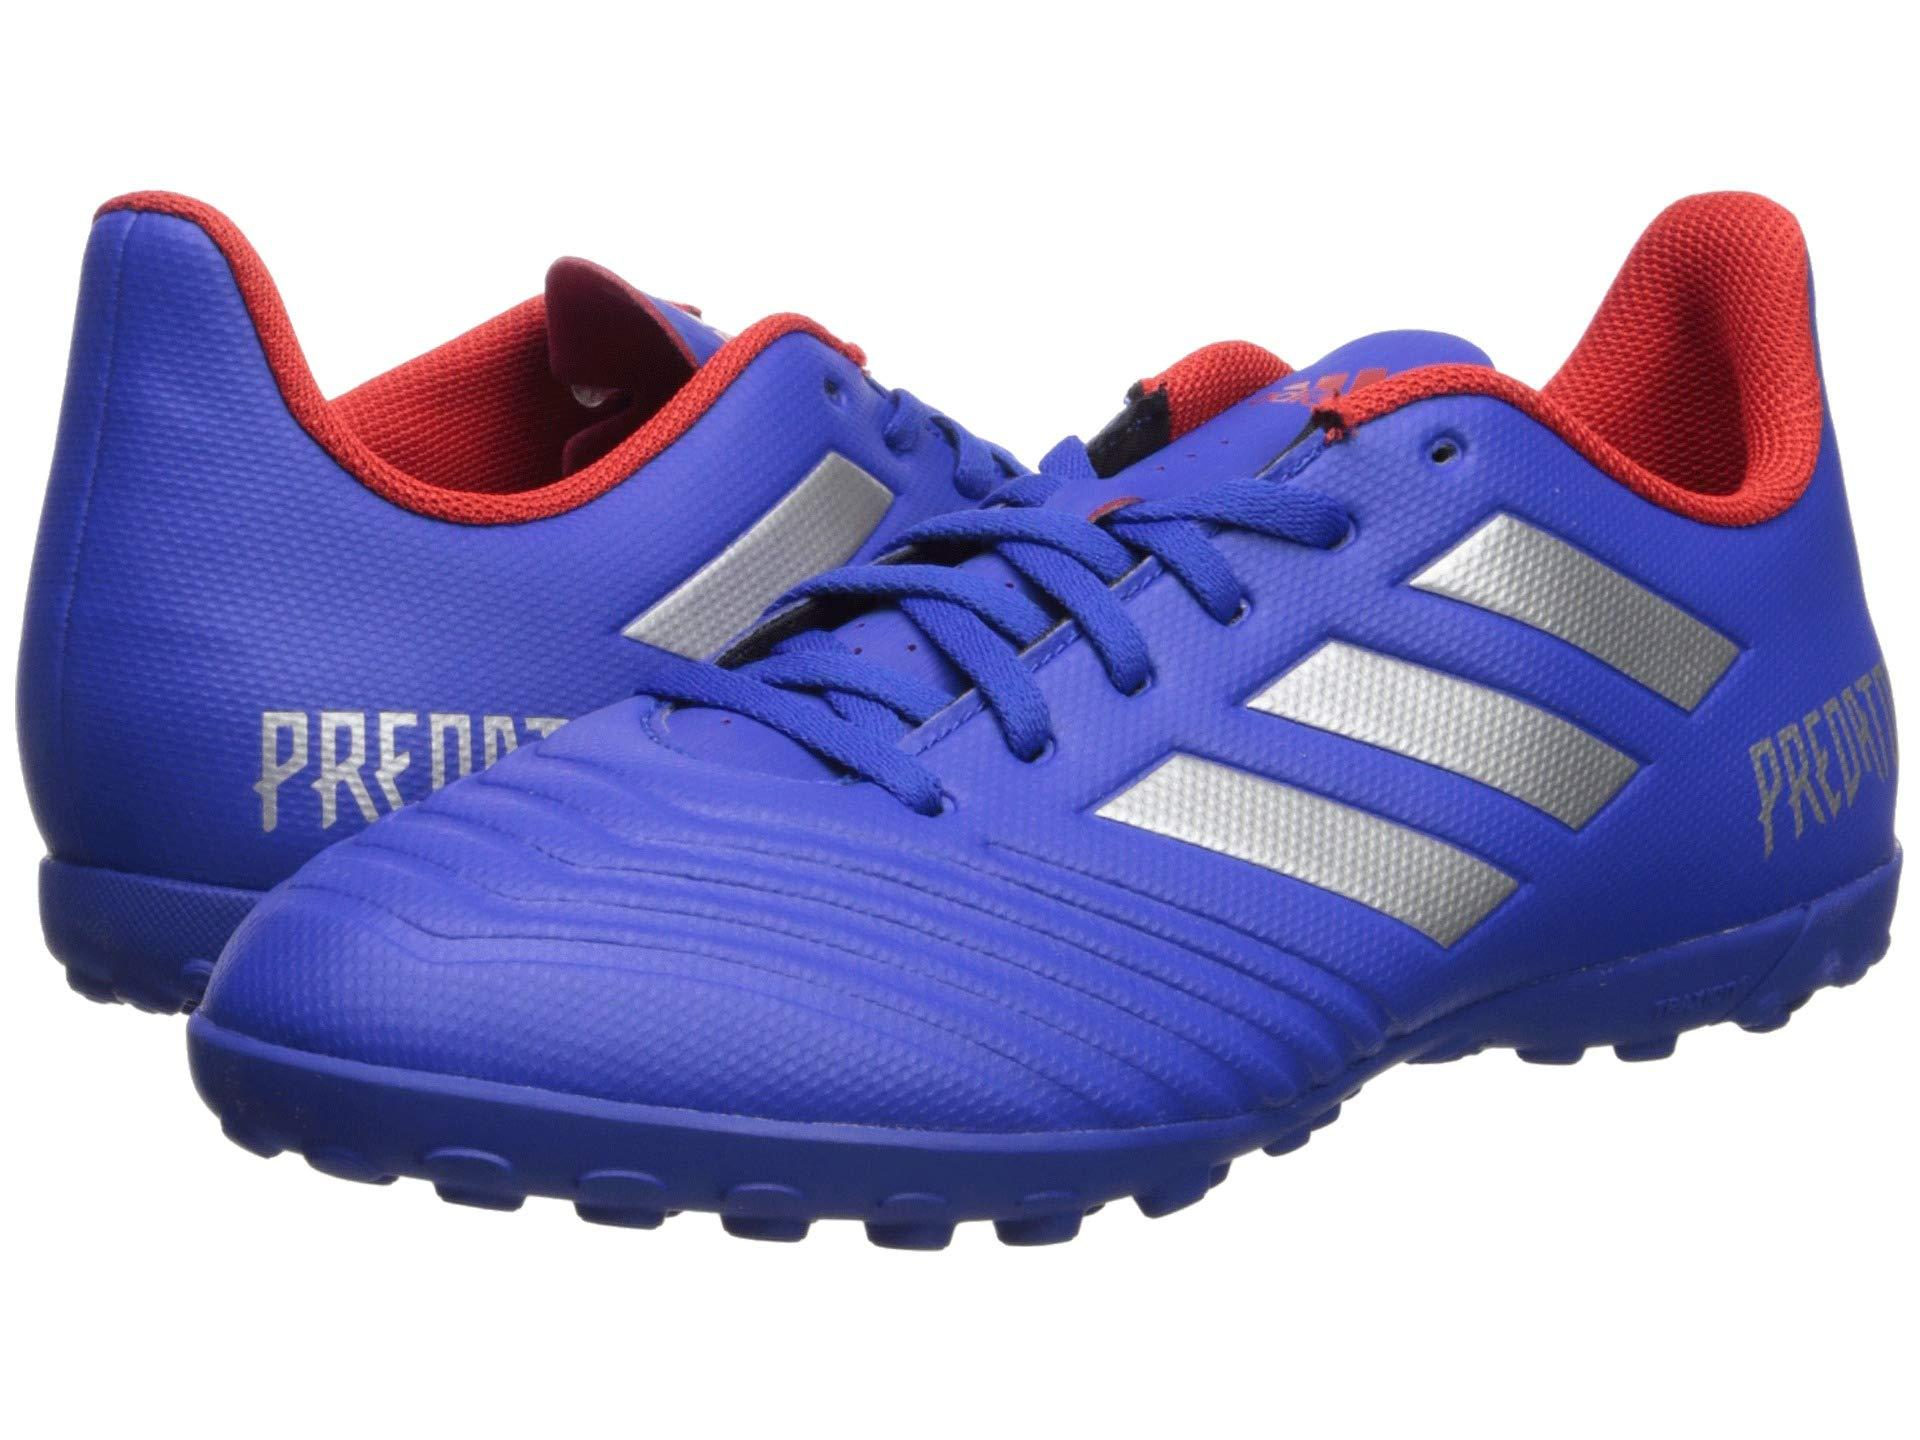 d9dda0d99ee adidas. Predator 19.4 Tf (bold Blue silver Metallic active Red) Men s  Soccer Shoes